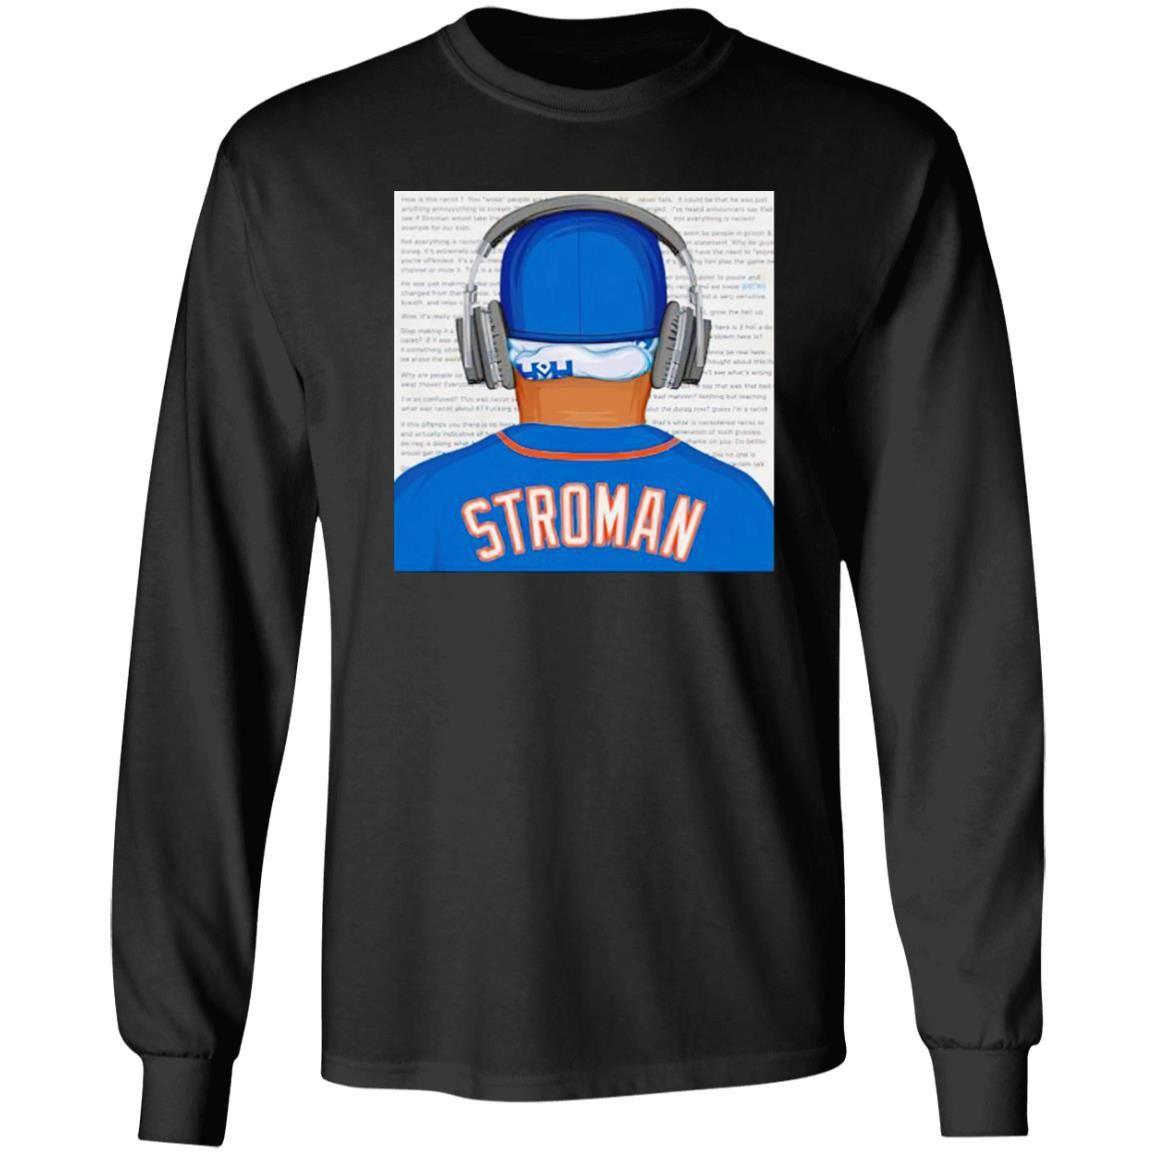 Marcus Stroman Men's shirt